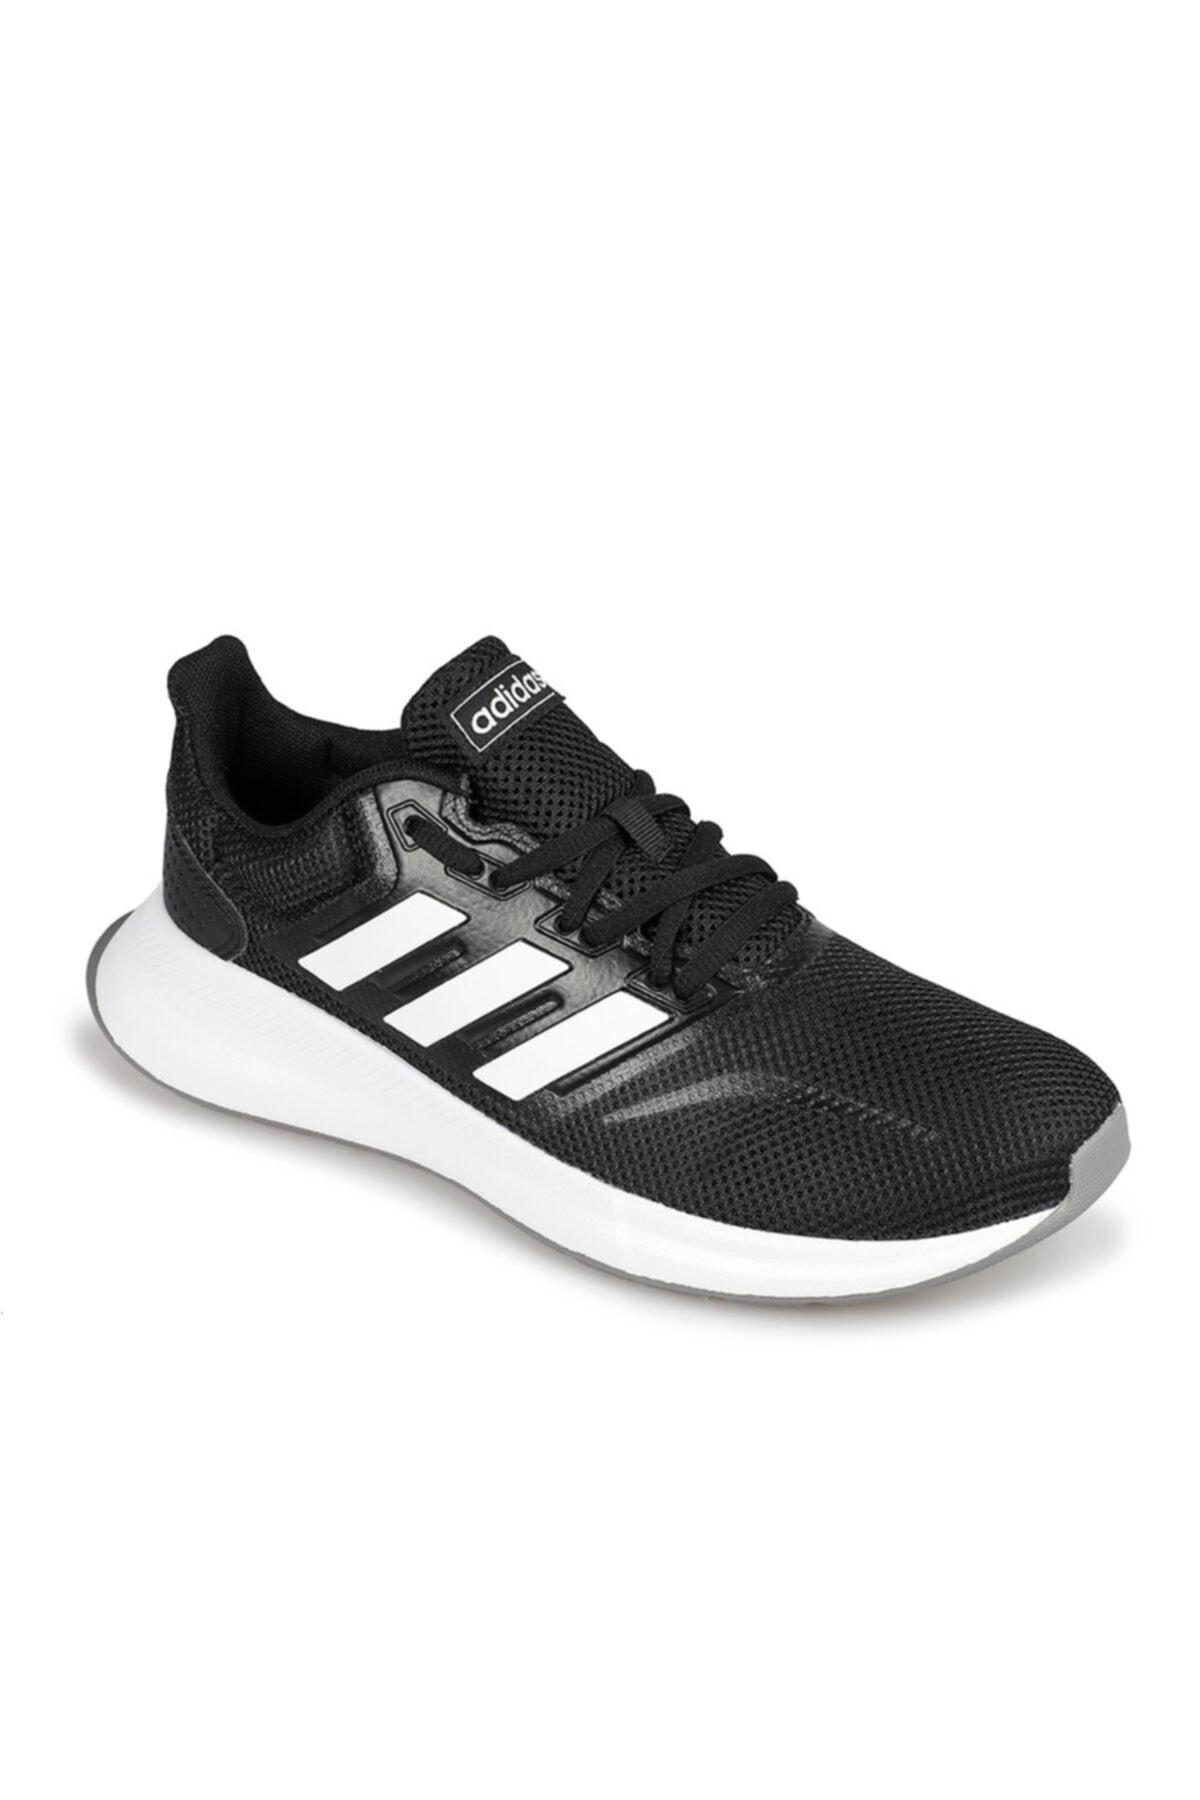 adidas Runfalcon Kadın Siyah Koşu Ayakkabıs F36218 1